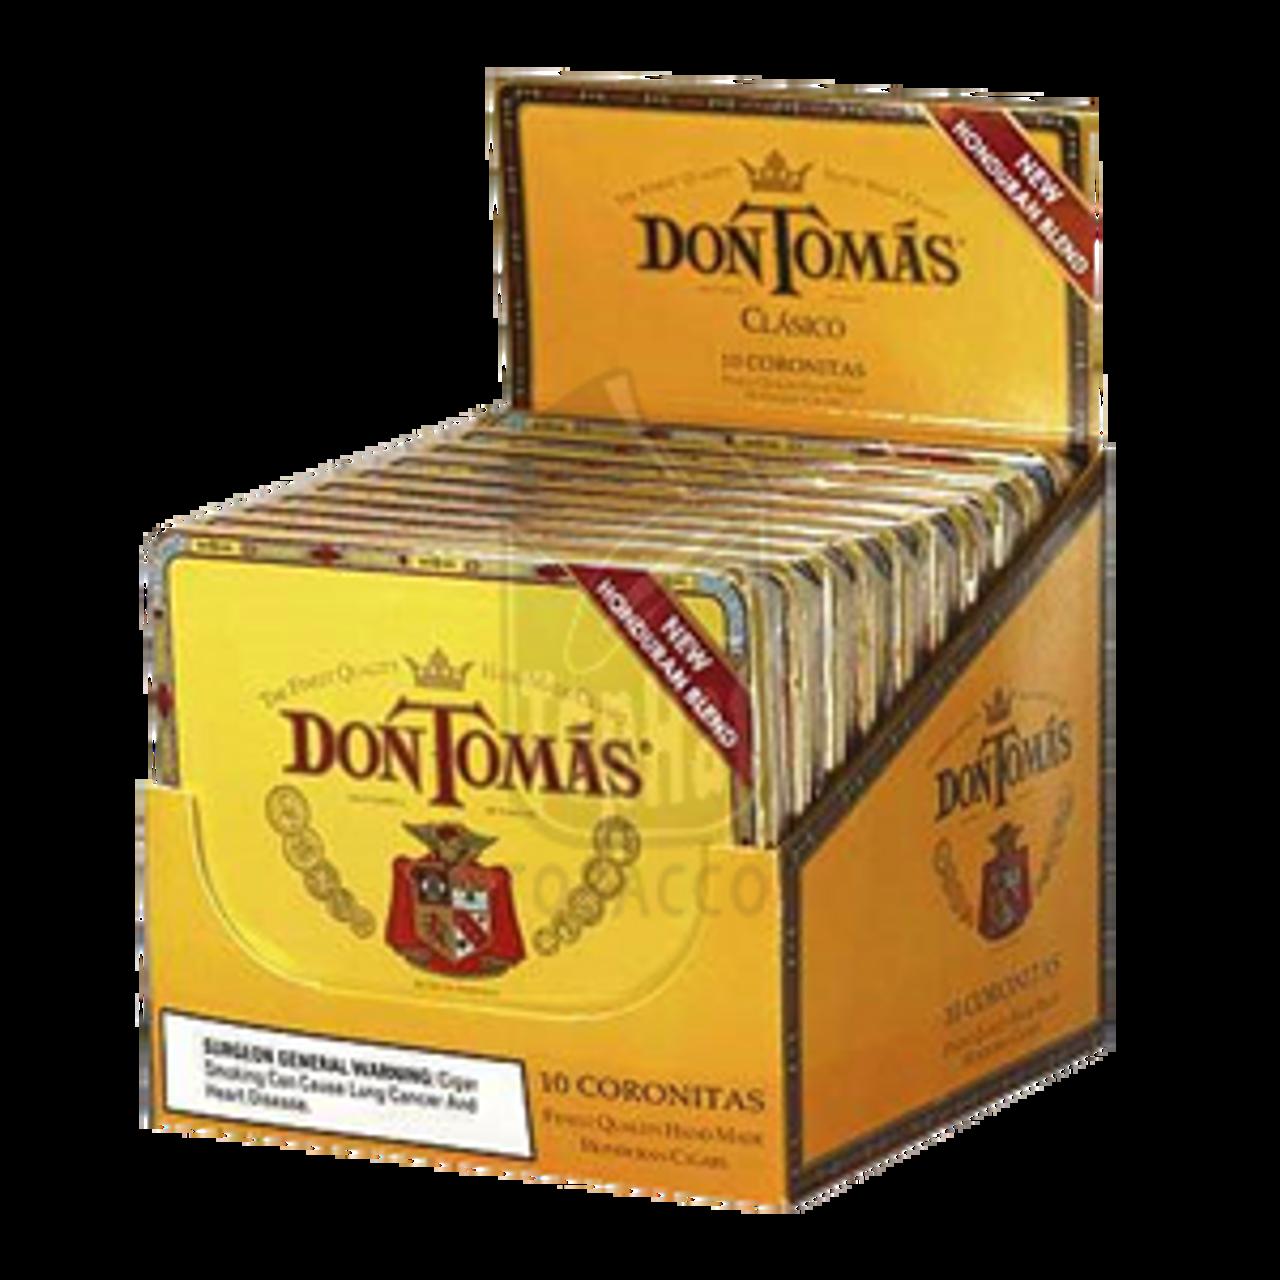 Don Tomas Clasico Coronitas Cigars - 4 x 32 (10 Packs of 10)